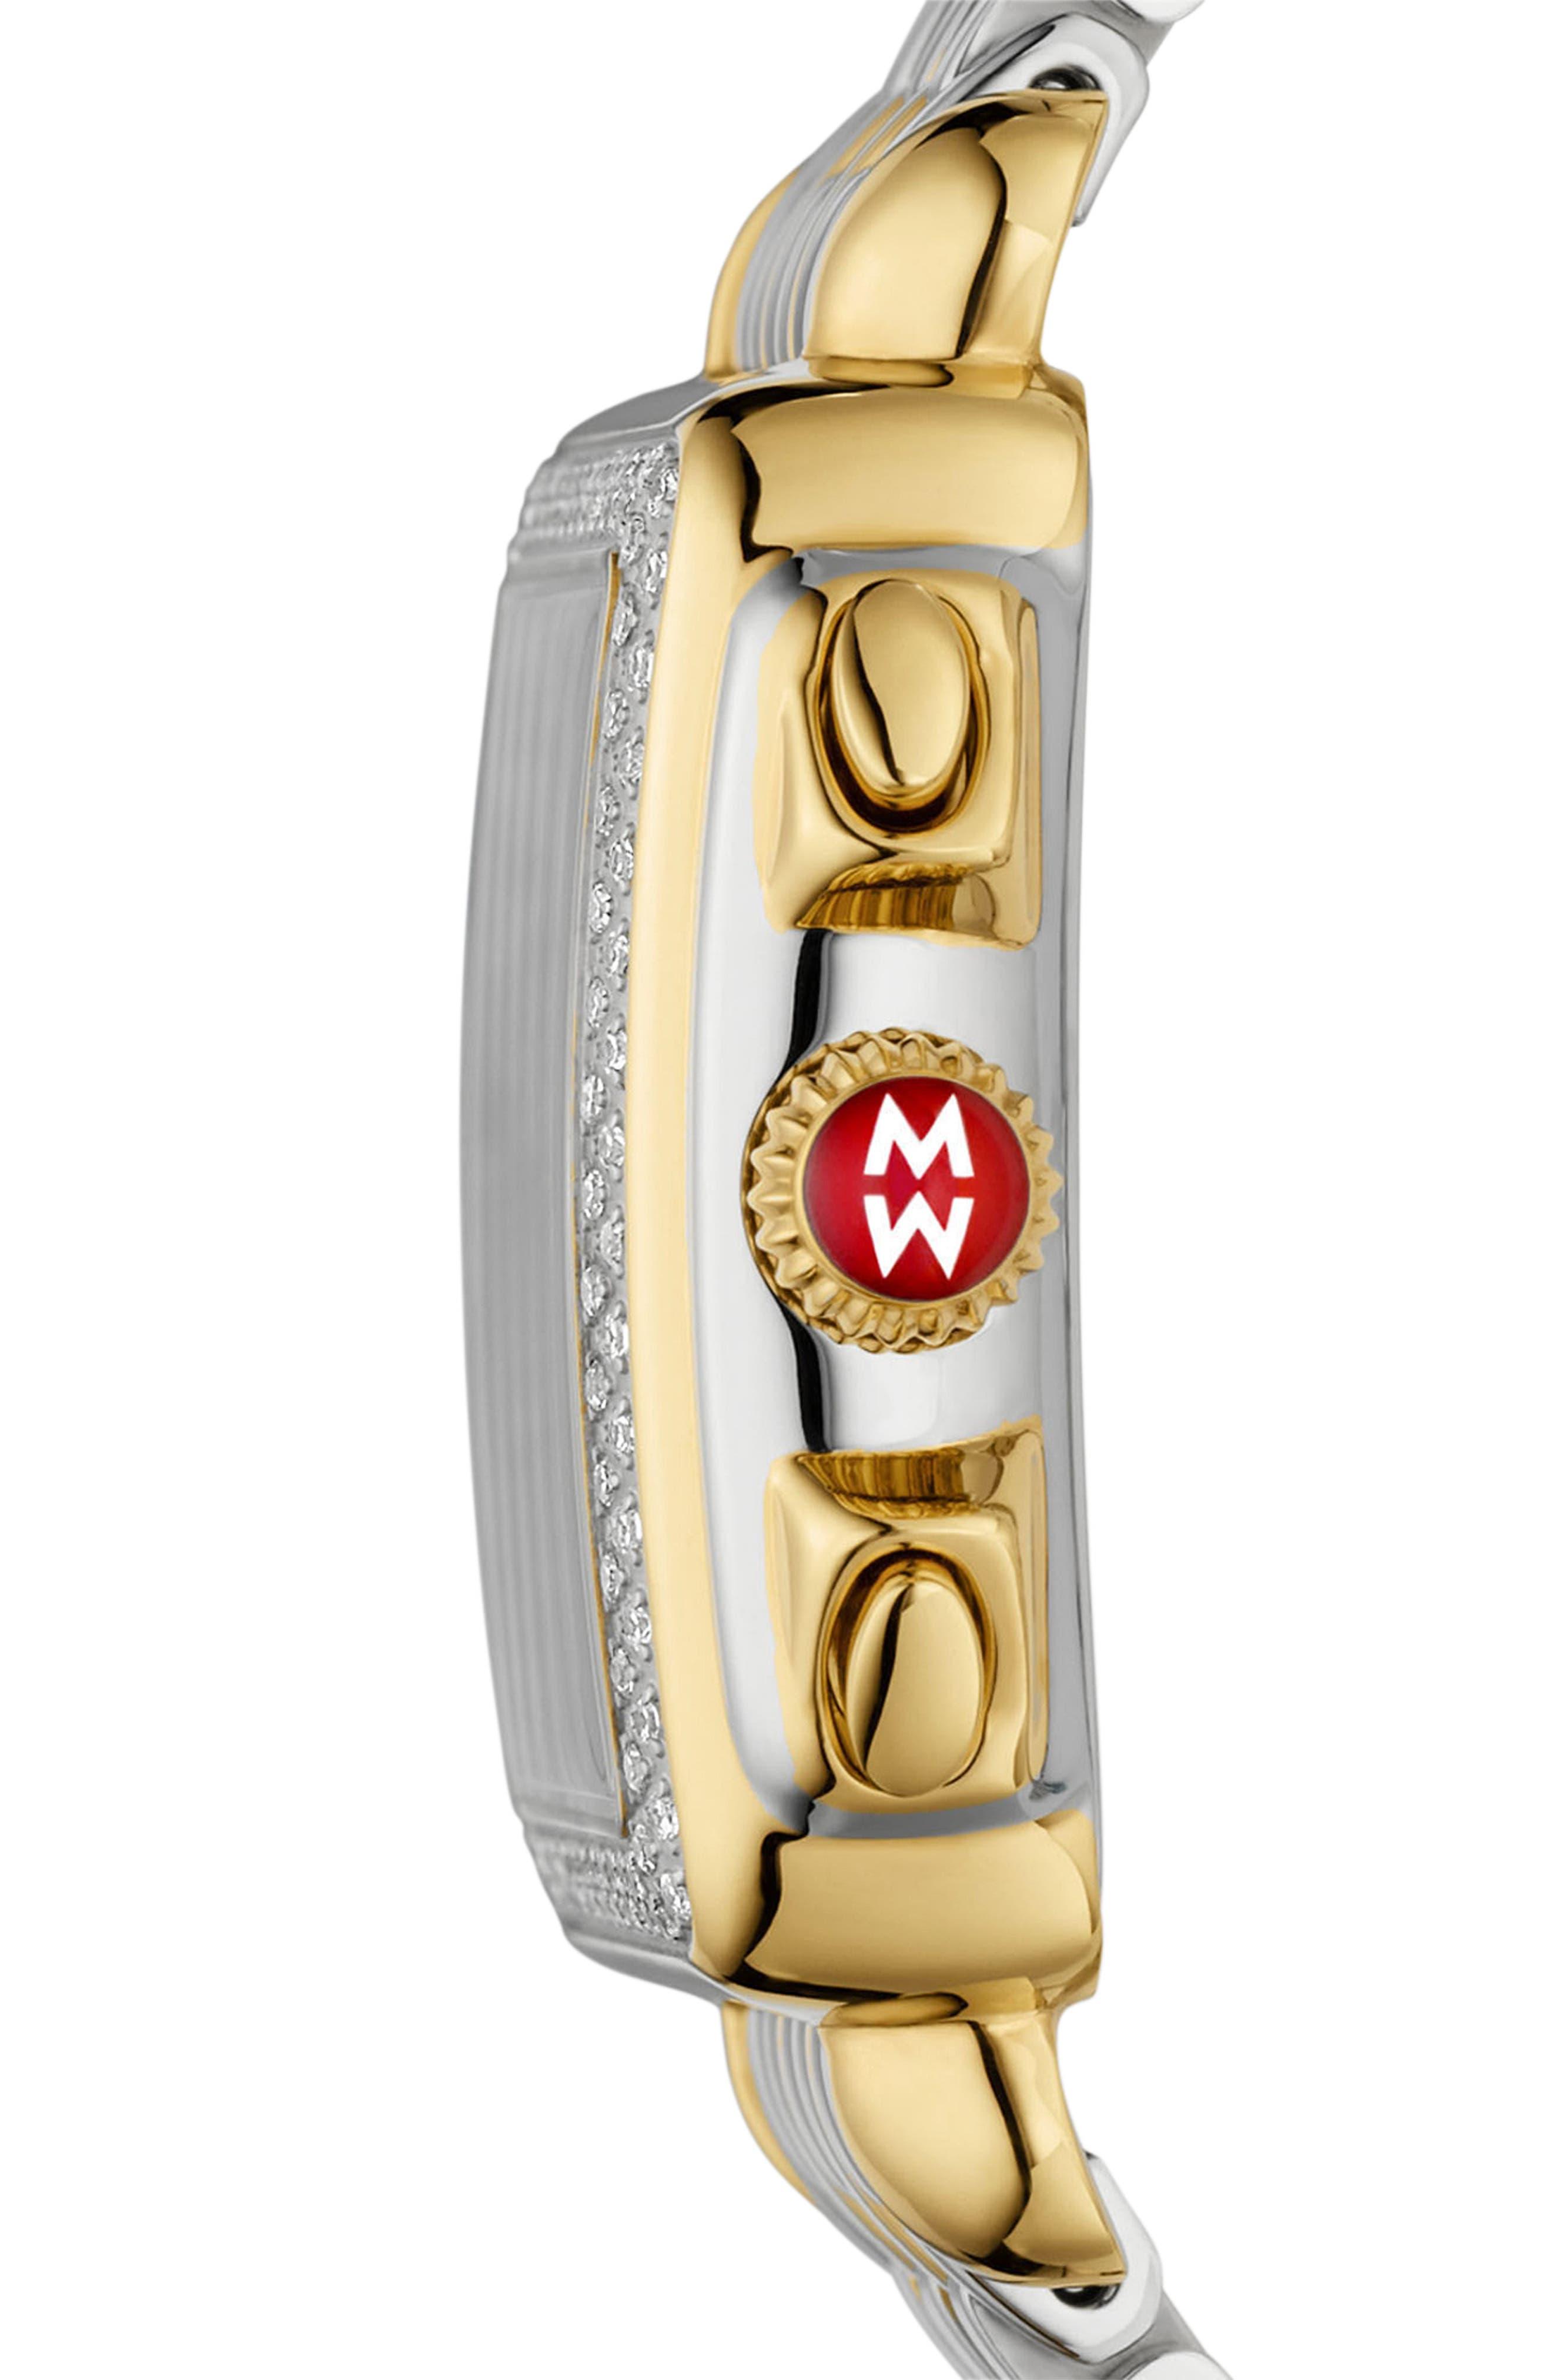 MICHELE, Deco Diamond Diamond Dial Watch Head, 33mm x 35mm, Alternate thumbnail 3, color, GOLD/ SILVER/ DESERT ROSE MOP